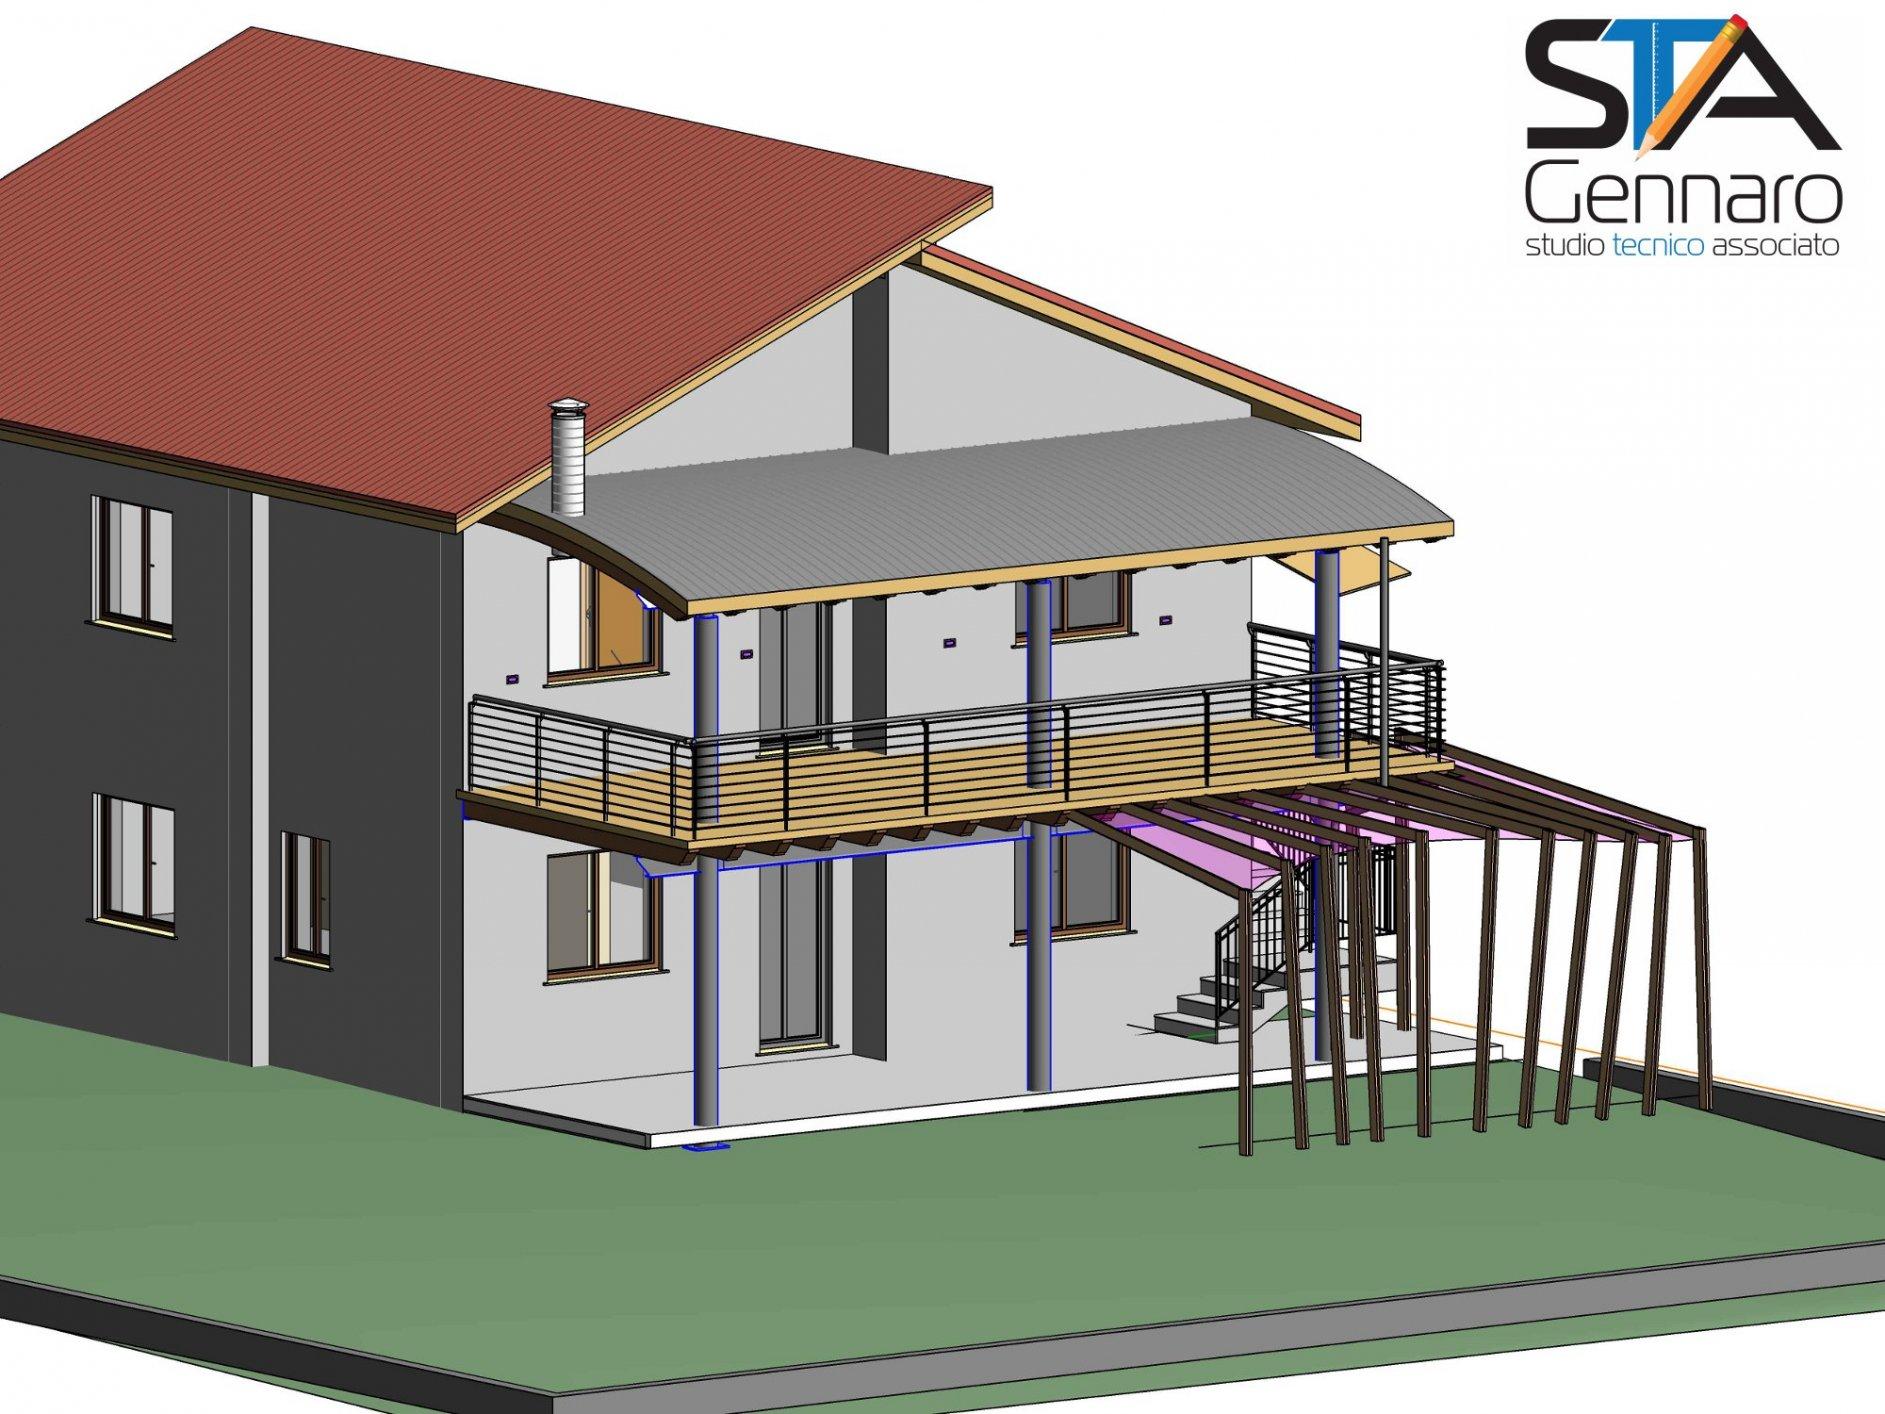 Ampliamento piano casa studio tecnico associato gennaro studio tecnico associato gennaro - Ampliamento casa ...